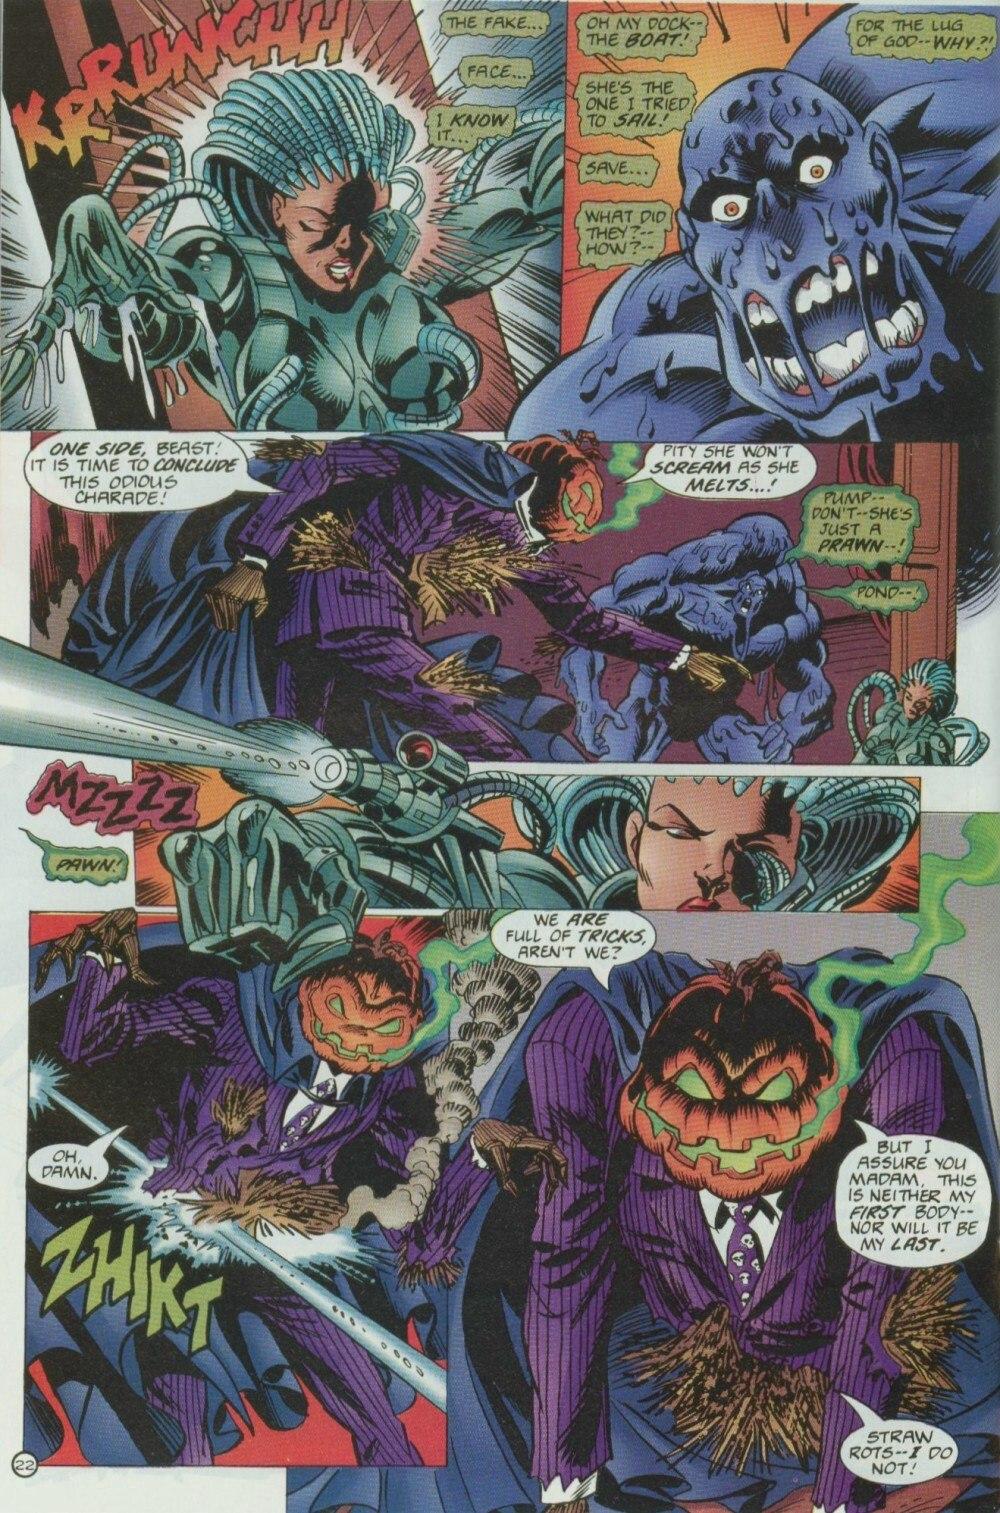 Read online Sludge comic -  Issue #9 - 26